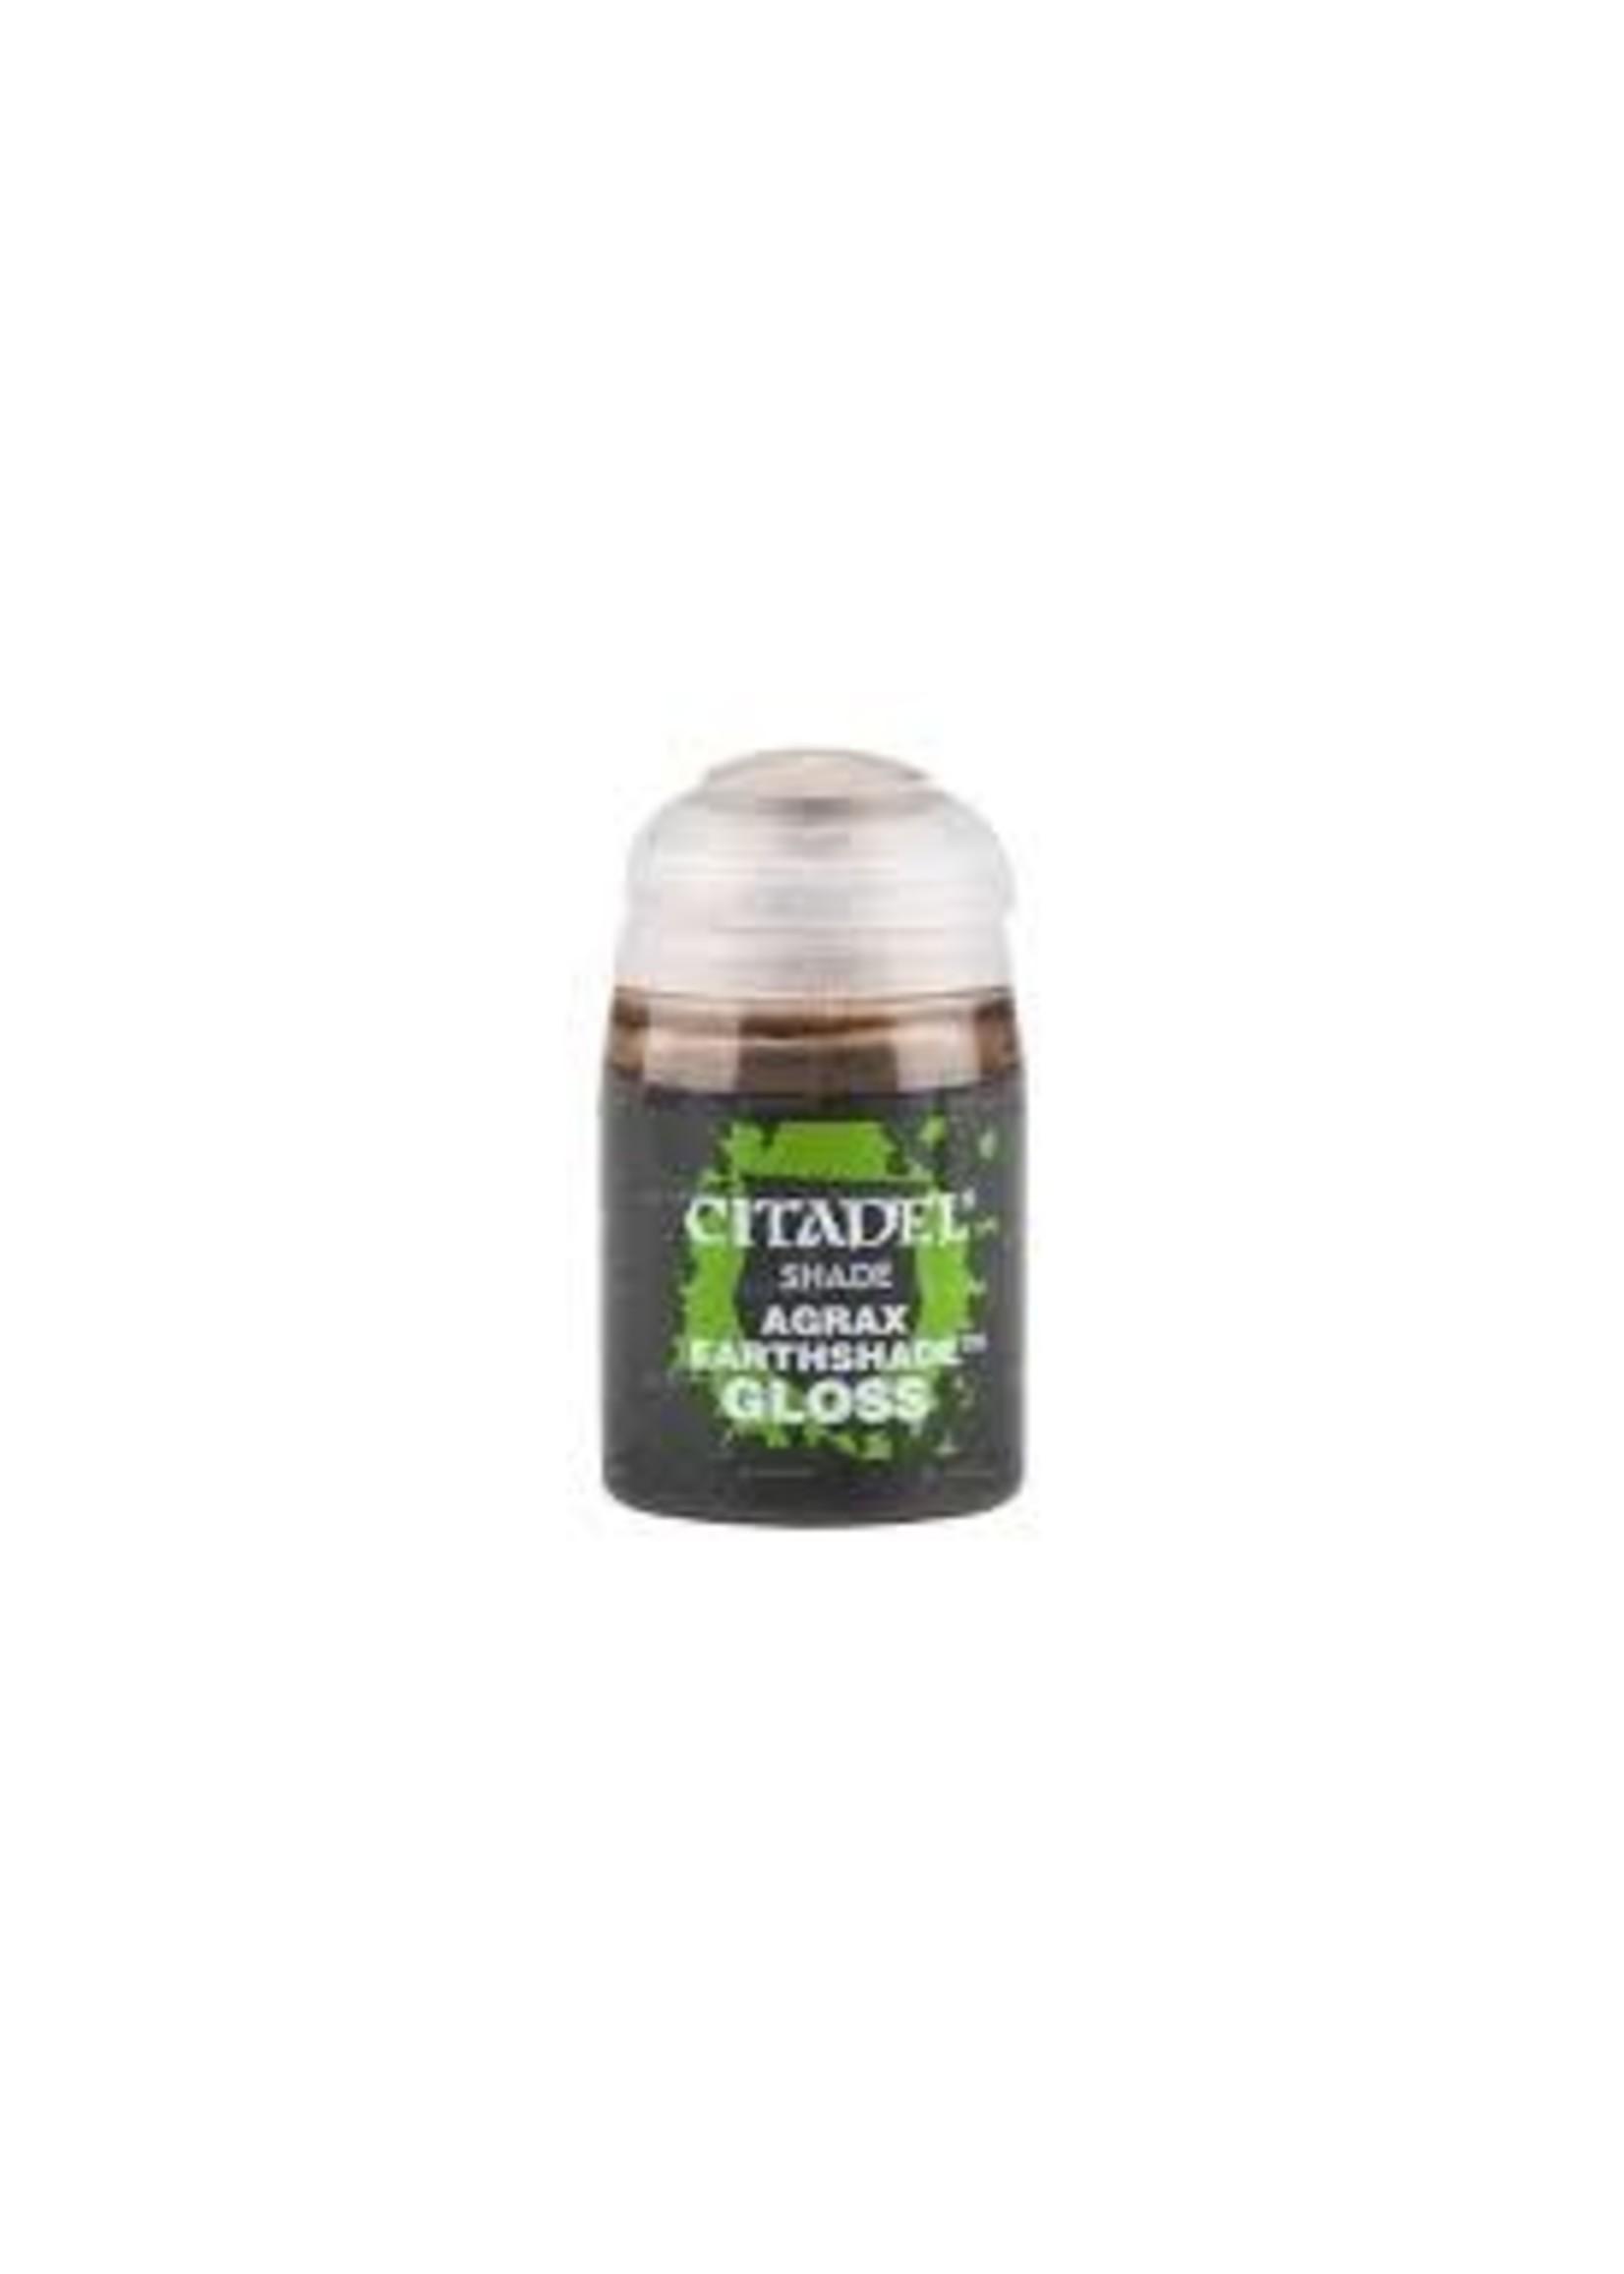 Citadel Paint Shade: Agrax Earthshade Gloss